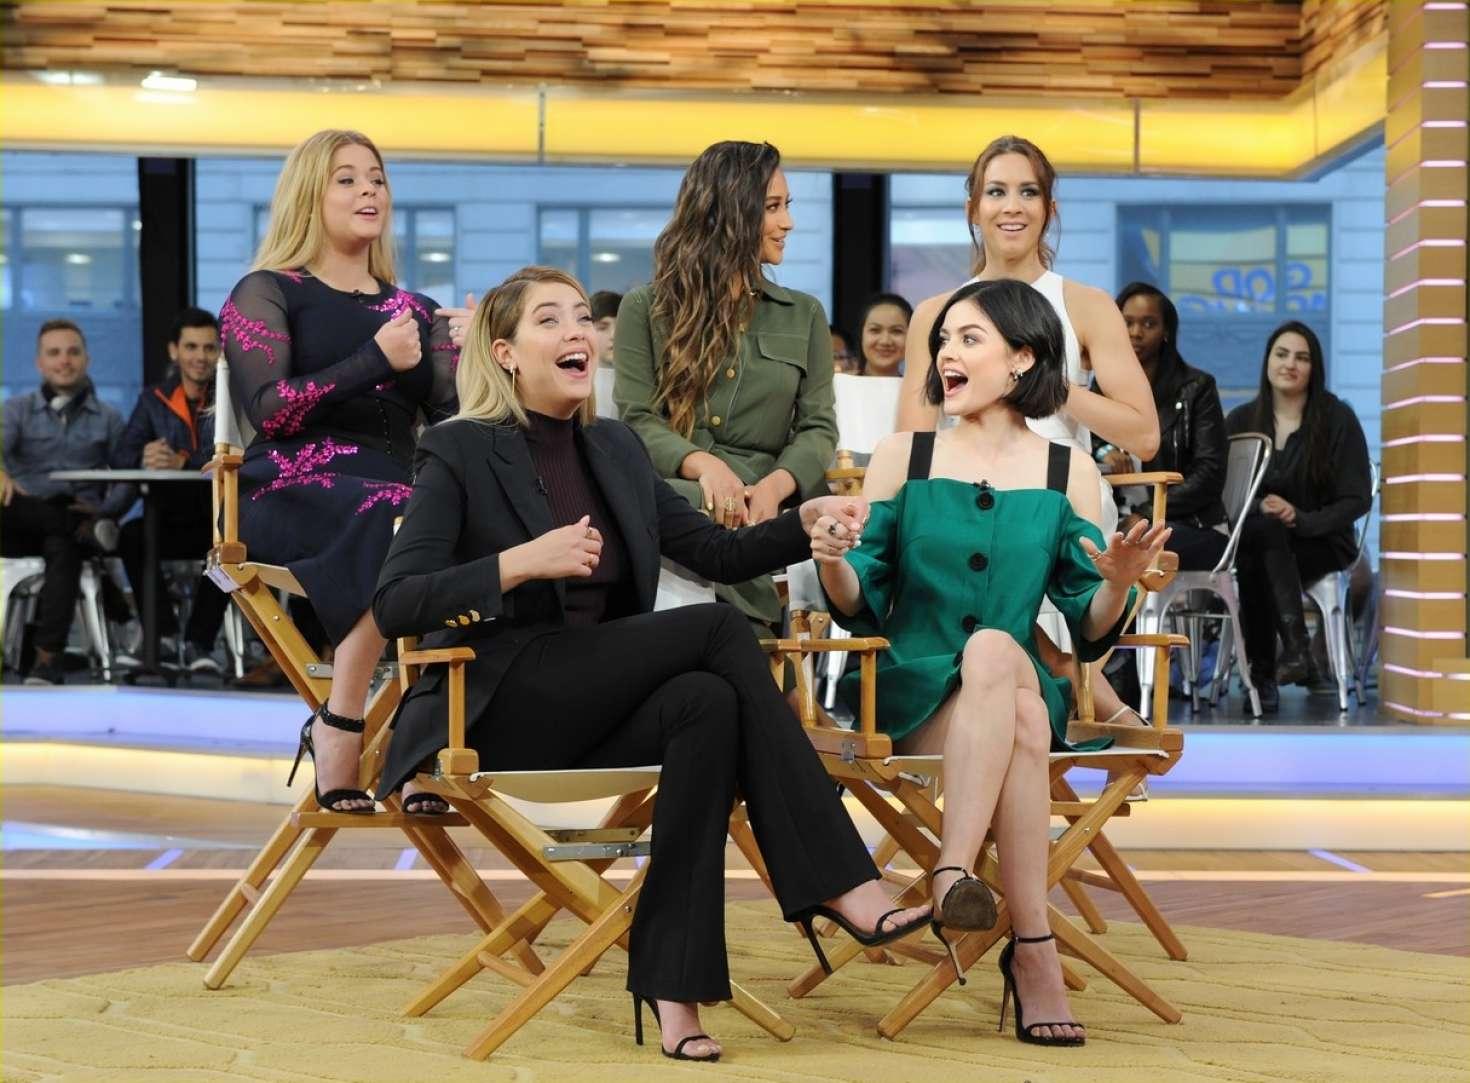 Good Morning America Latest News : Pretty little liars cast at good morning america in new